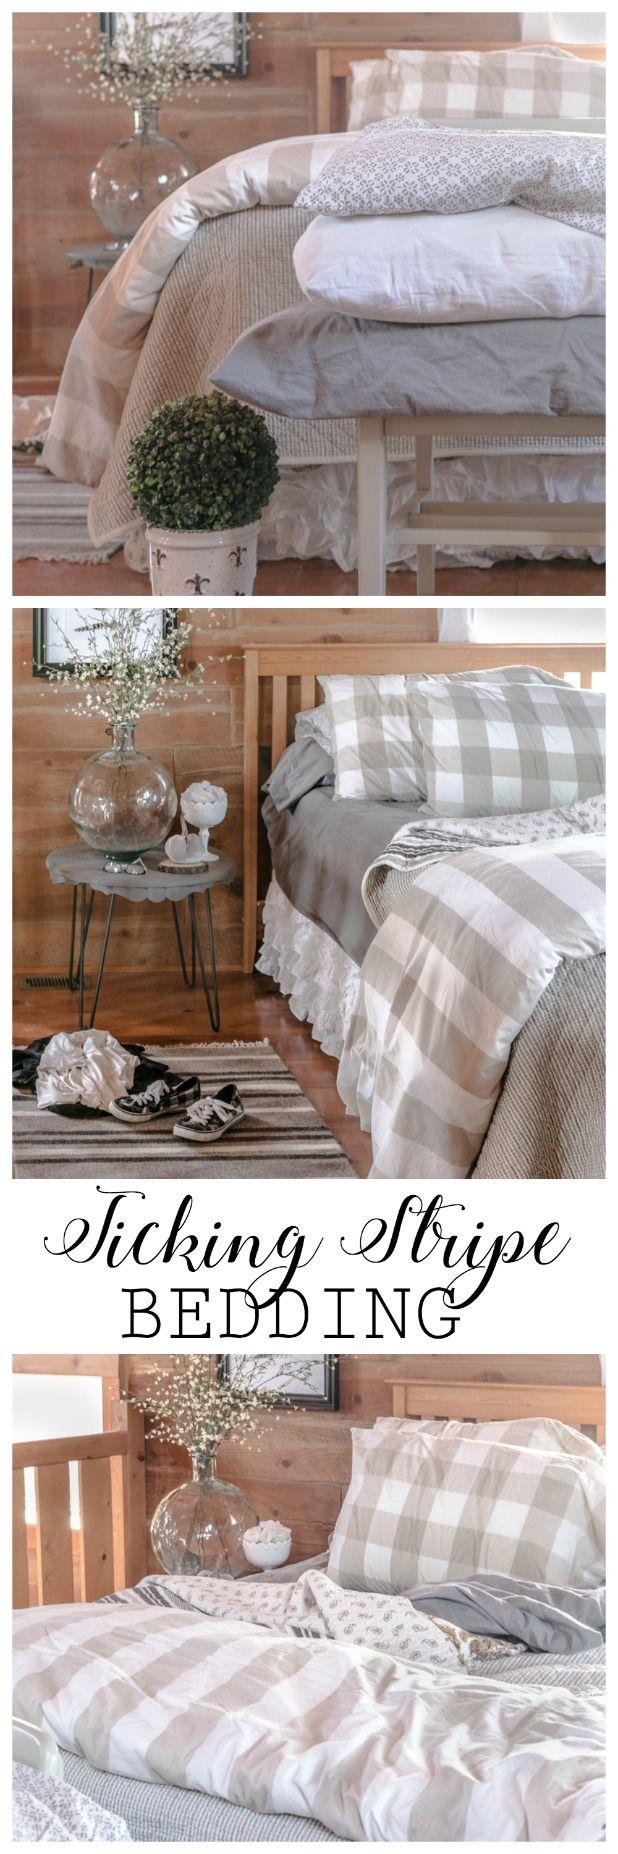 1180 best home decor | bedroom images on pinterest | bedrooms